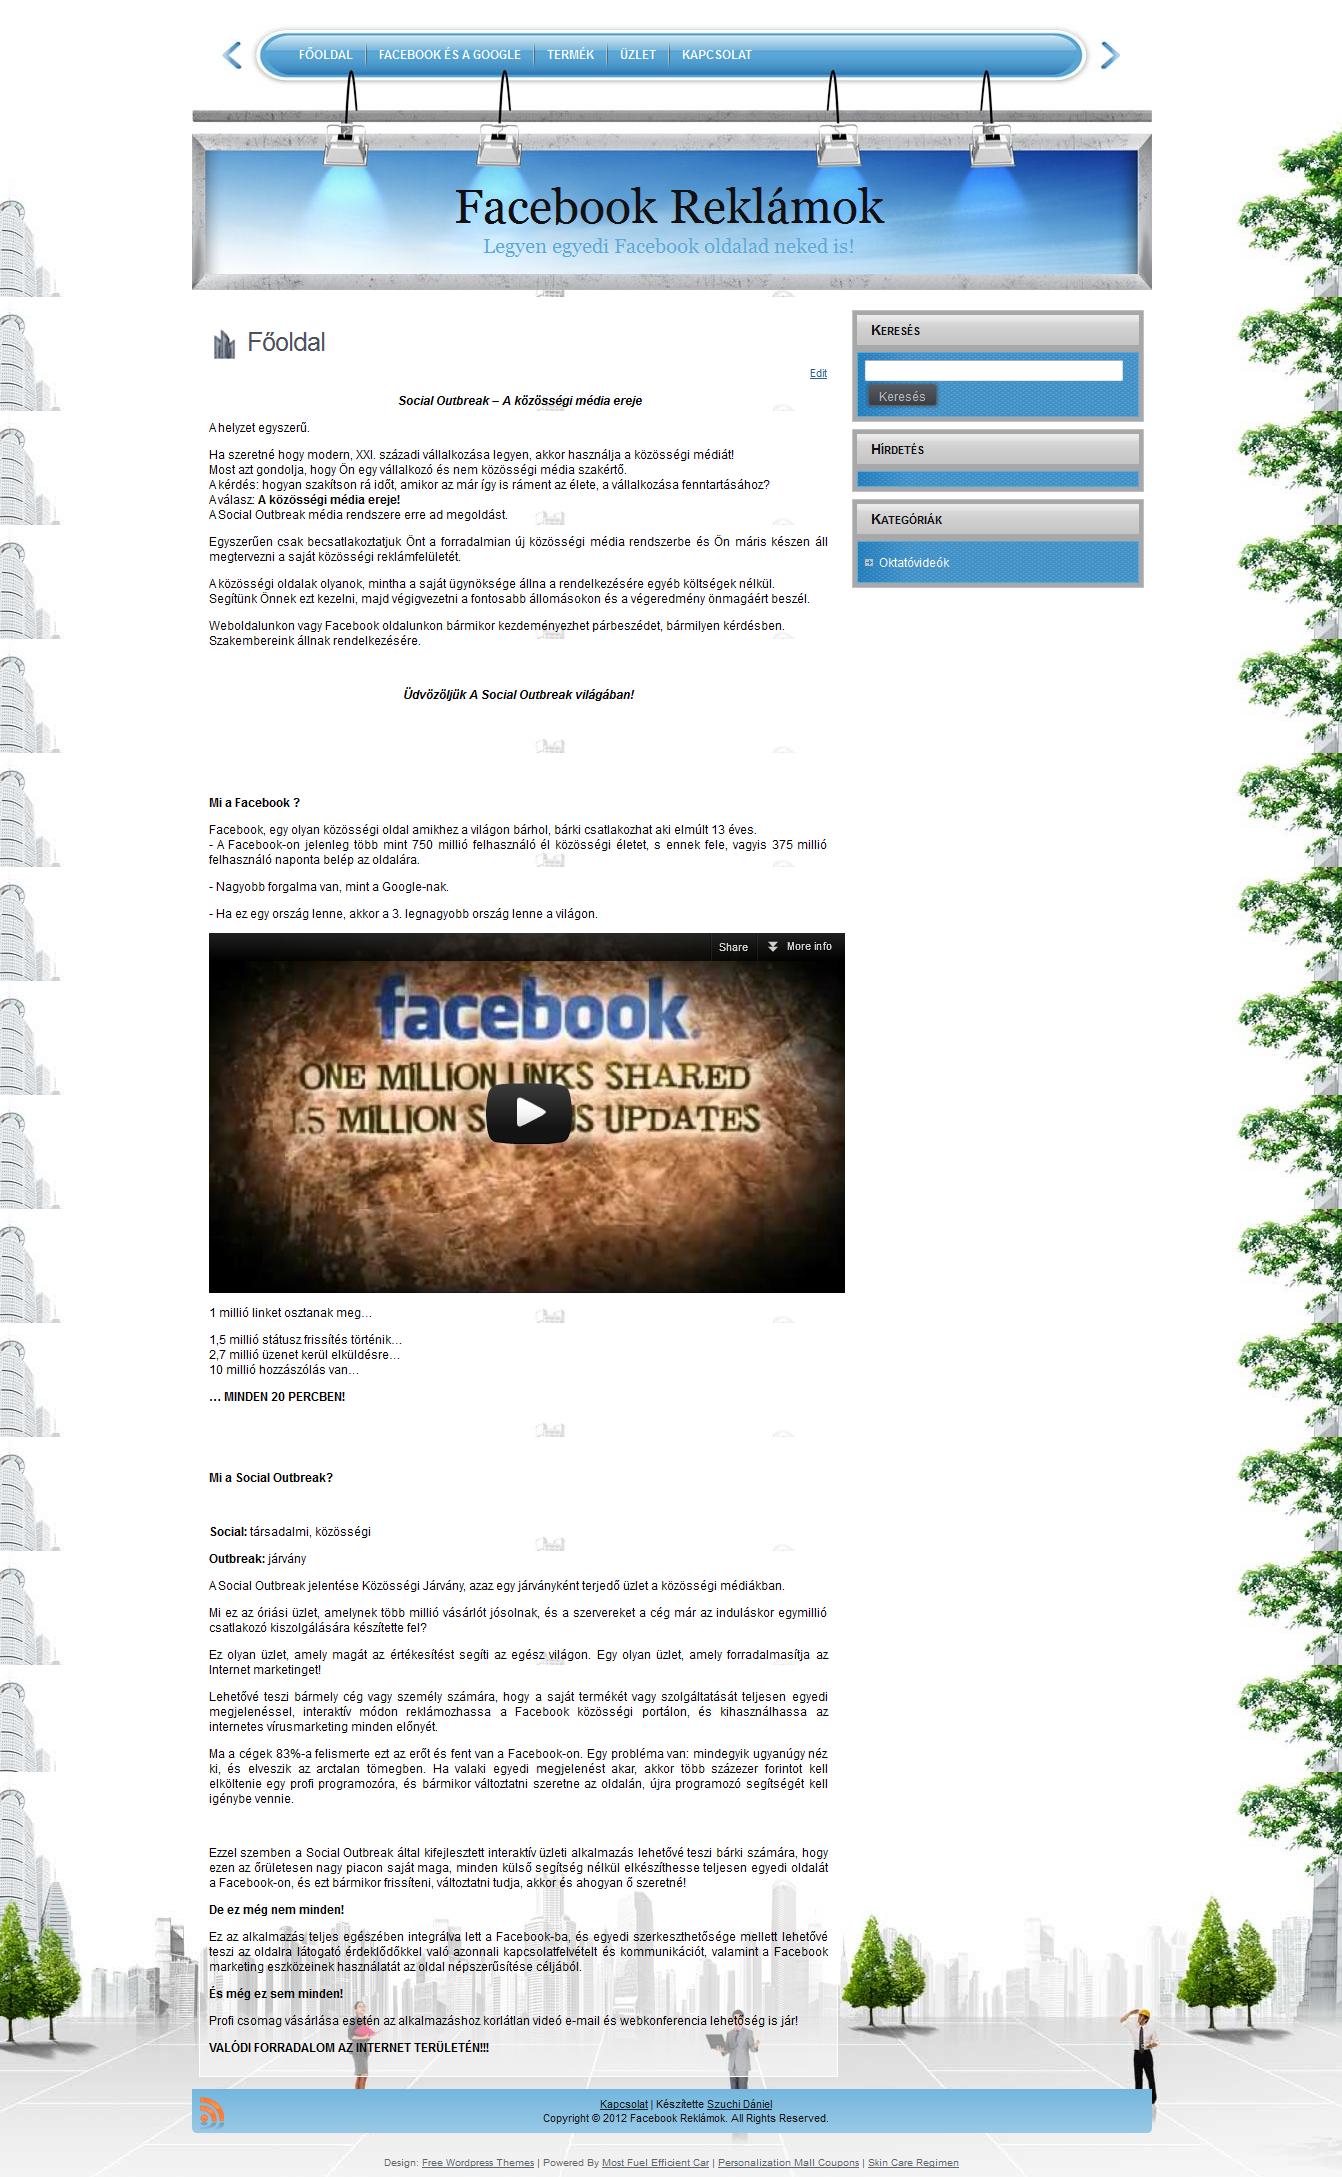 Facebookreklamok.hu